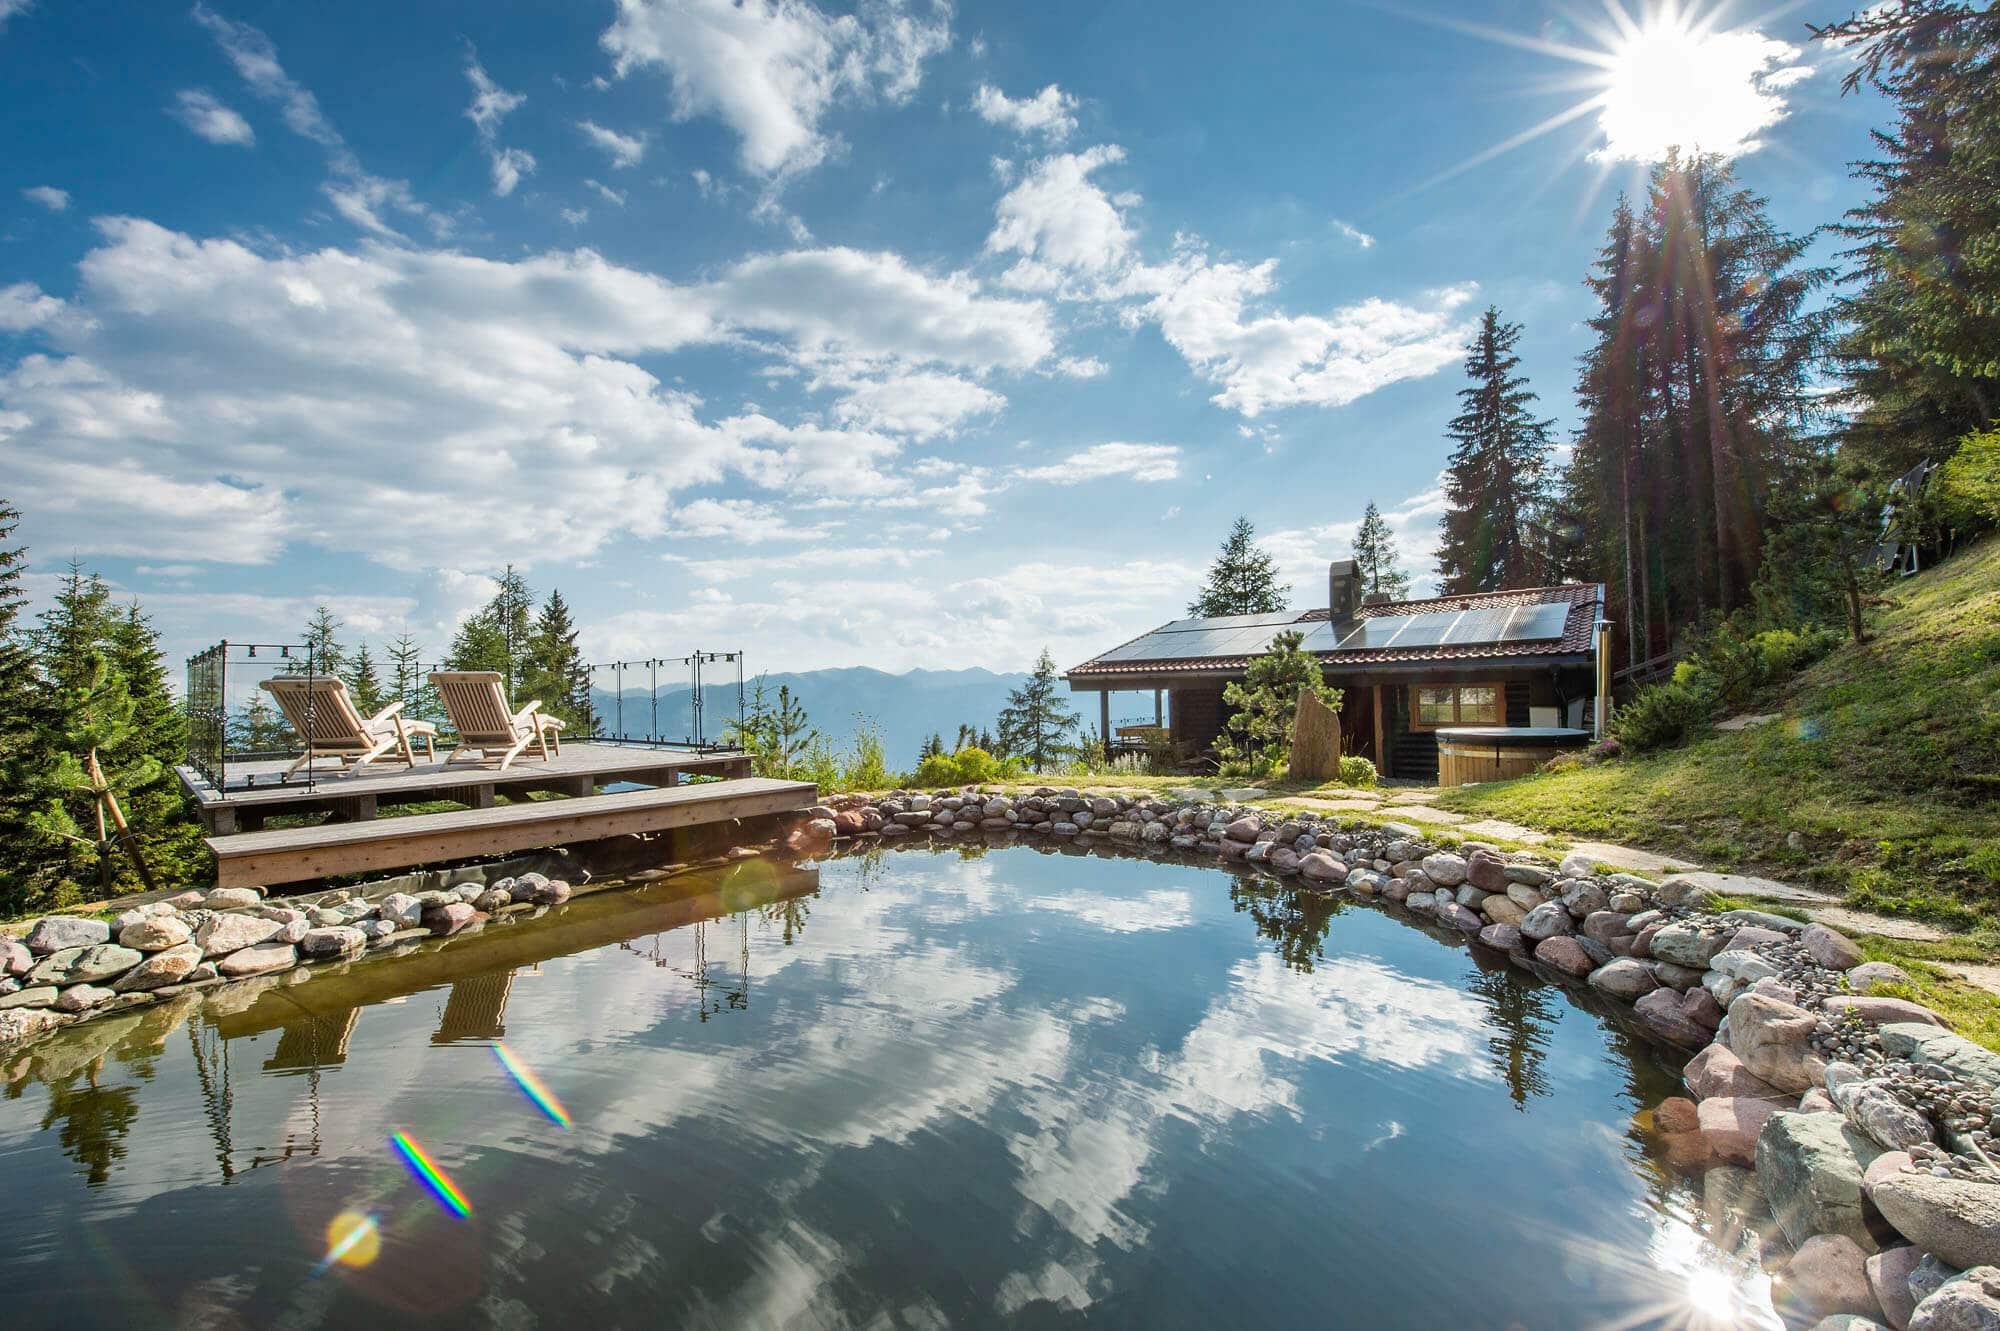 Naturbadeteich - Hotel KOLLERs in Seeboden © GAS - Rupert Mühlbacher